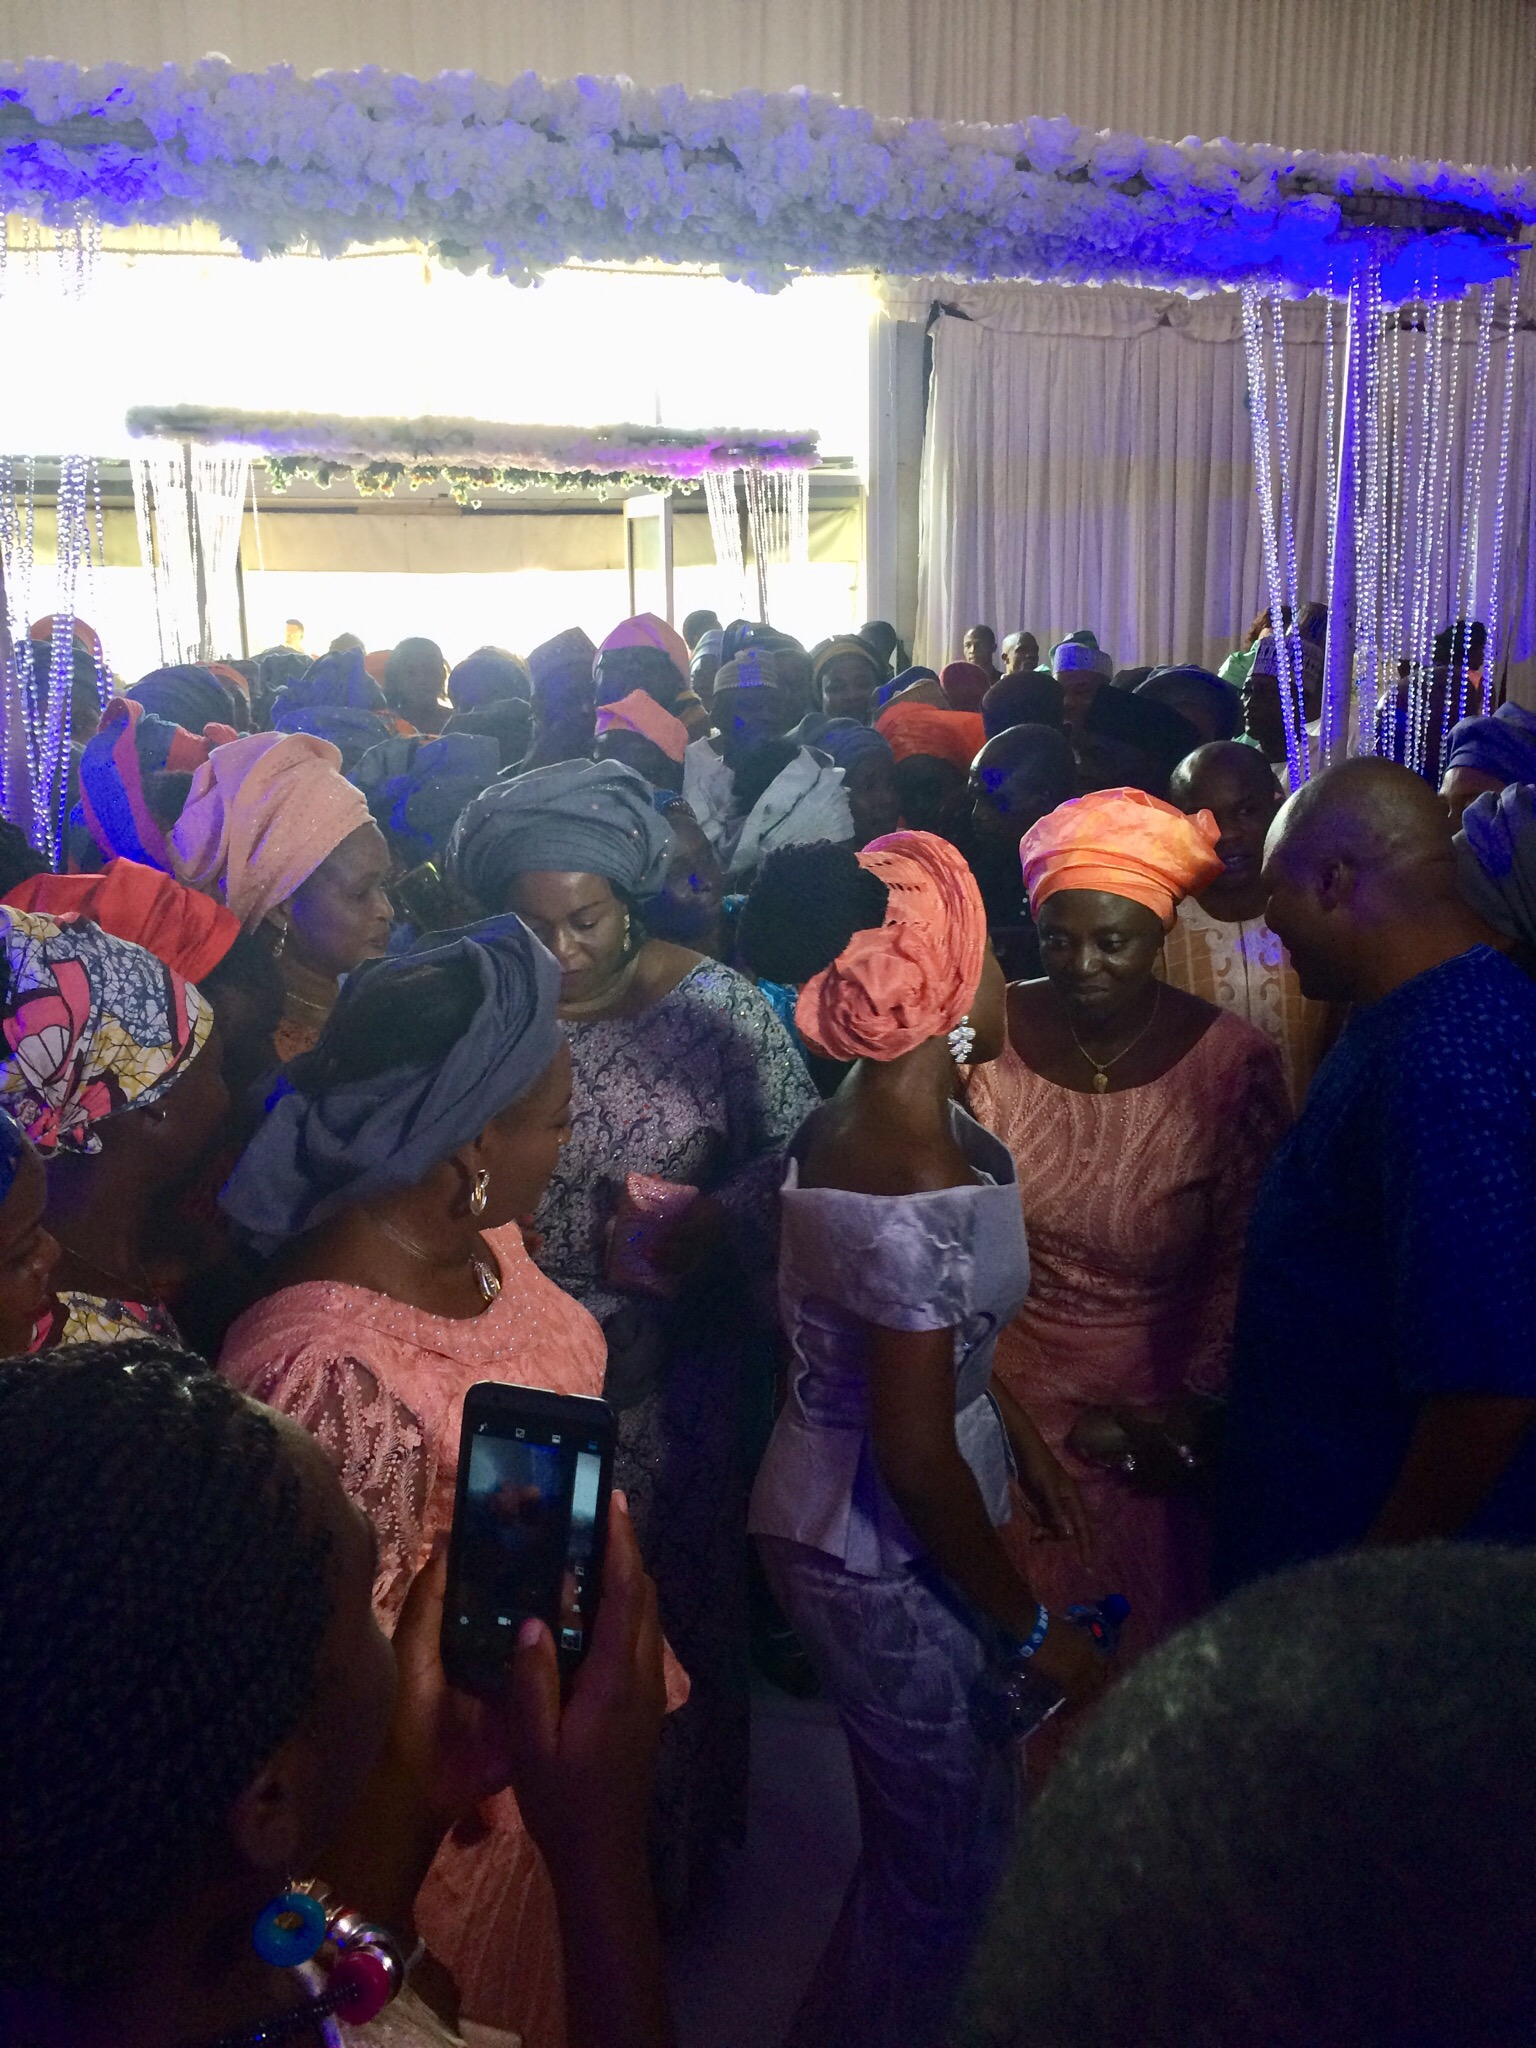 Bride's family dancing in